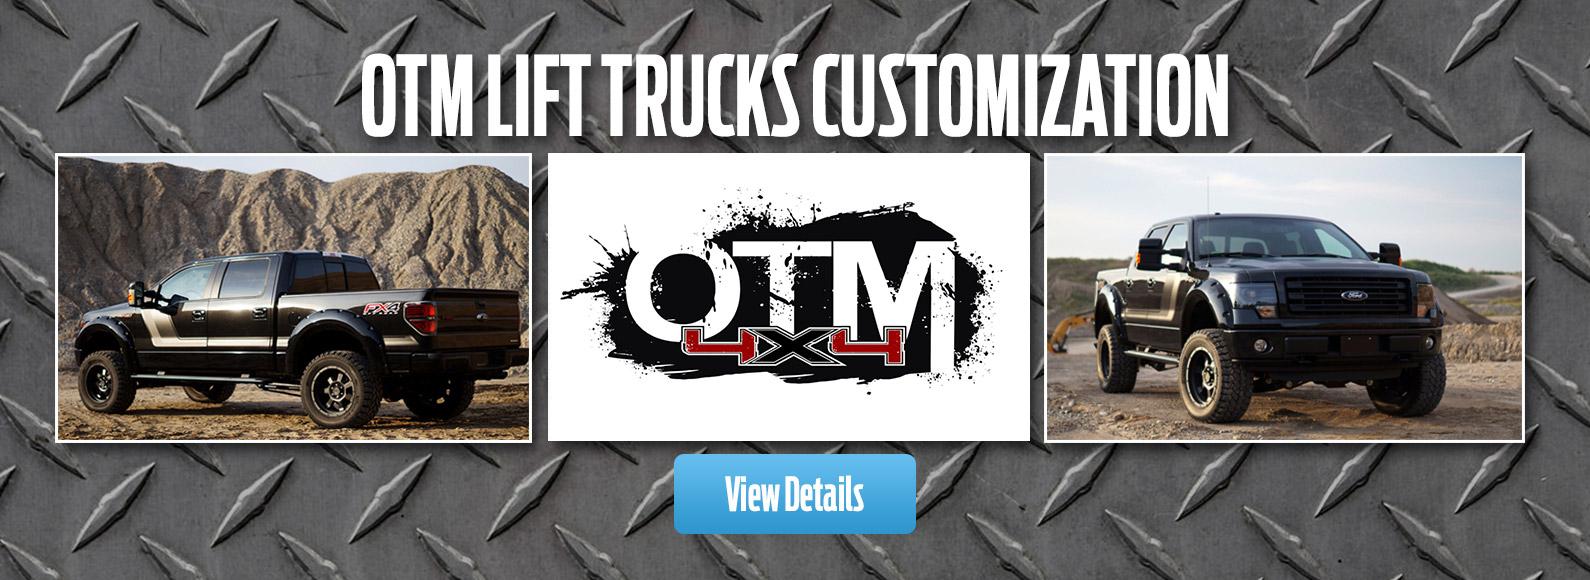 lift_trucks